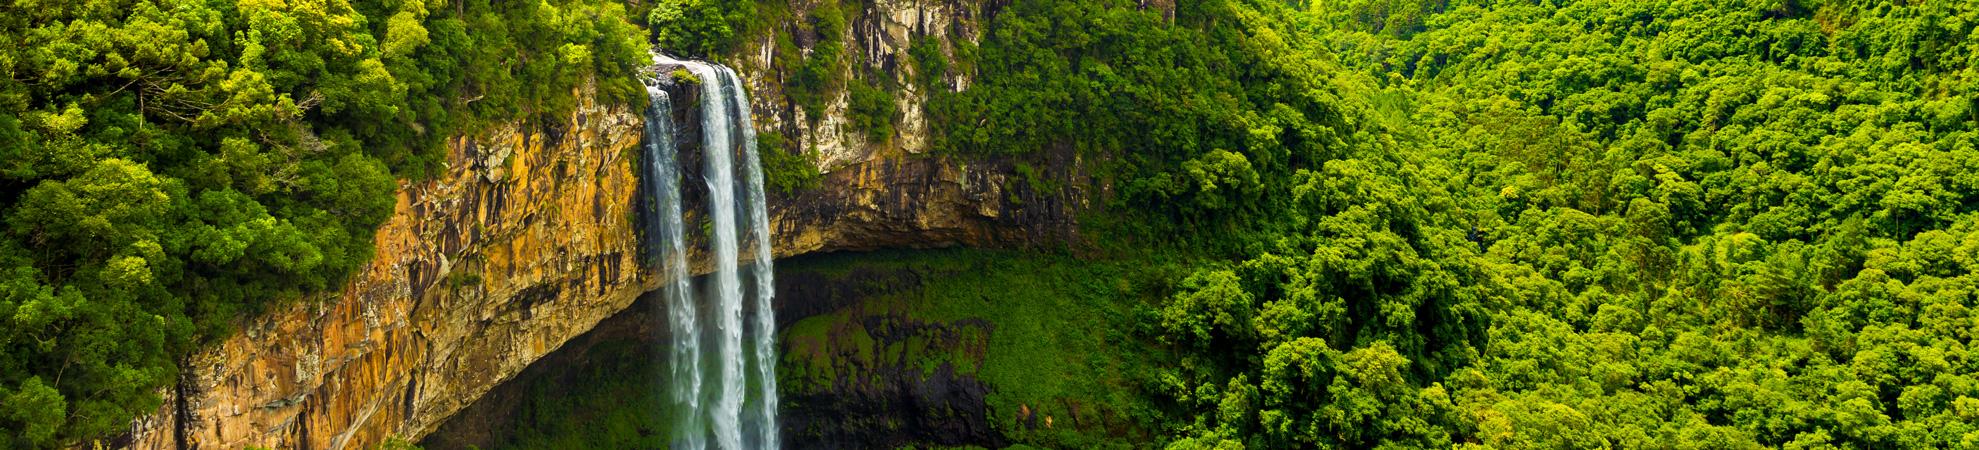 Costa Rica : les incontournables